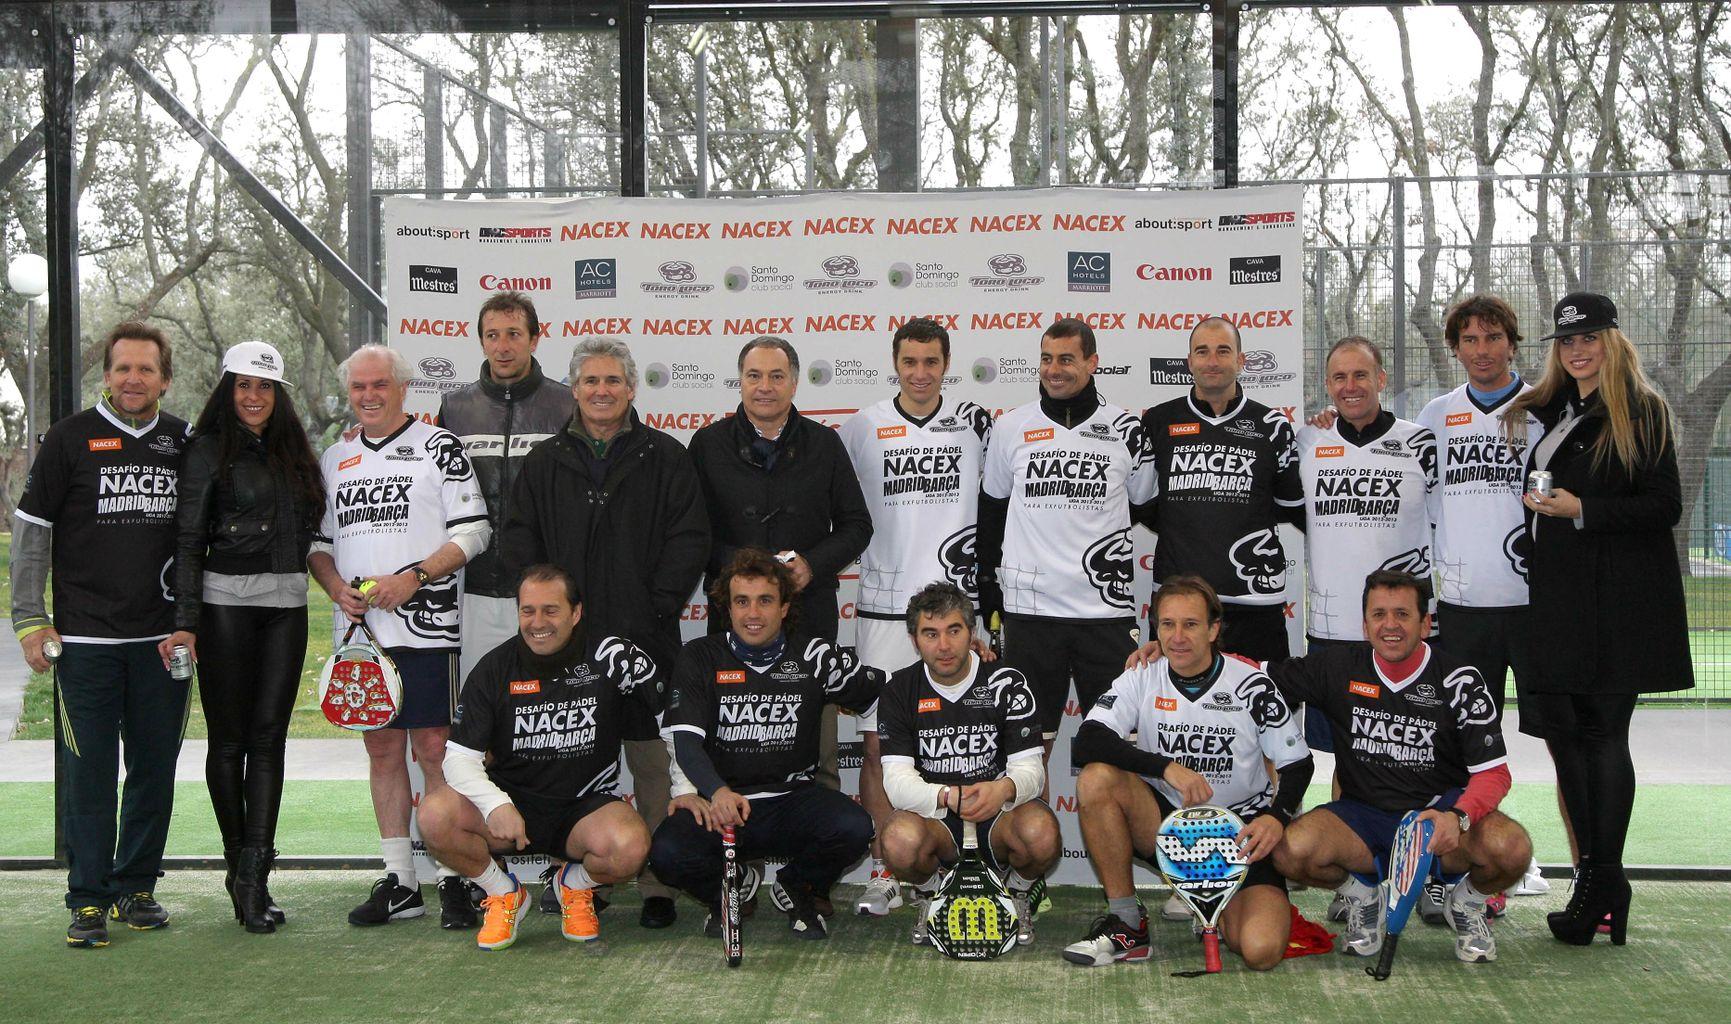 Desafio-Nacex-Madrid-Barça-2013